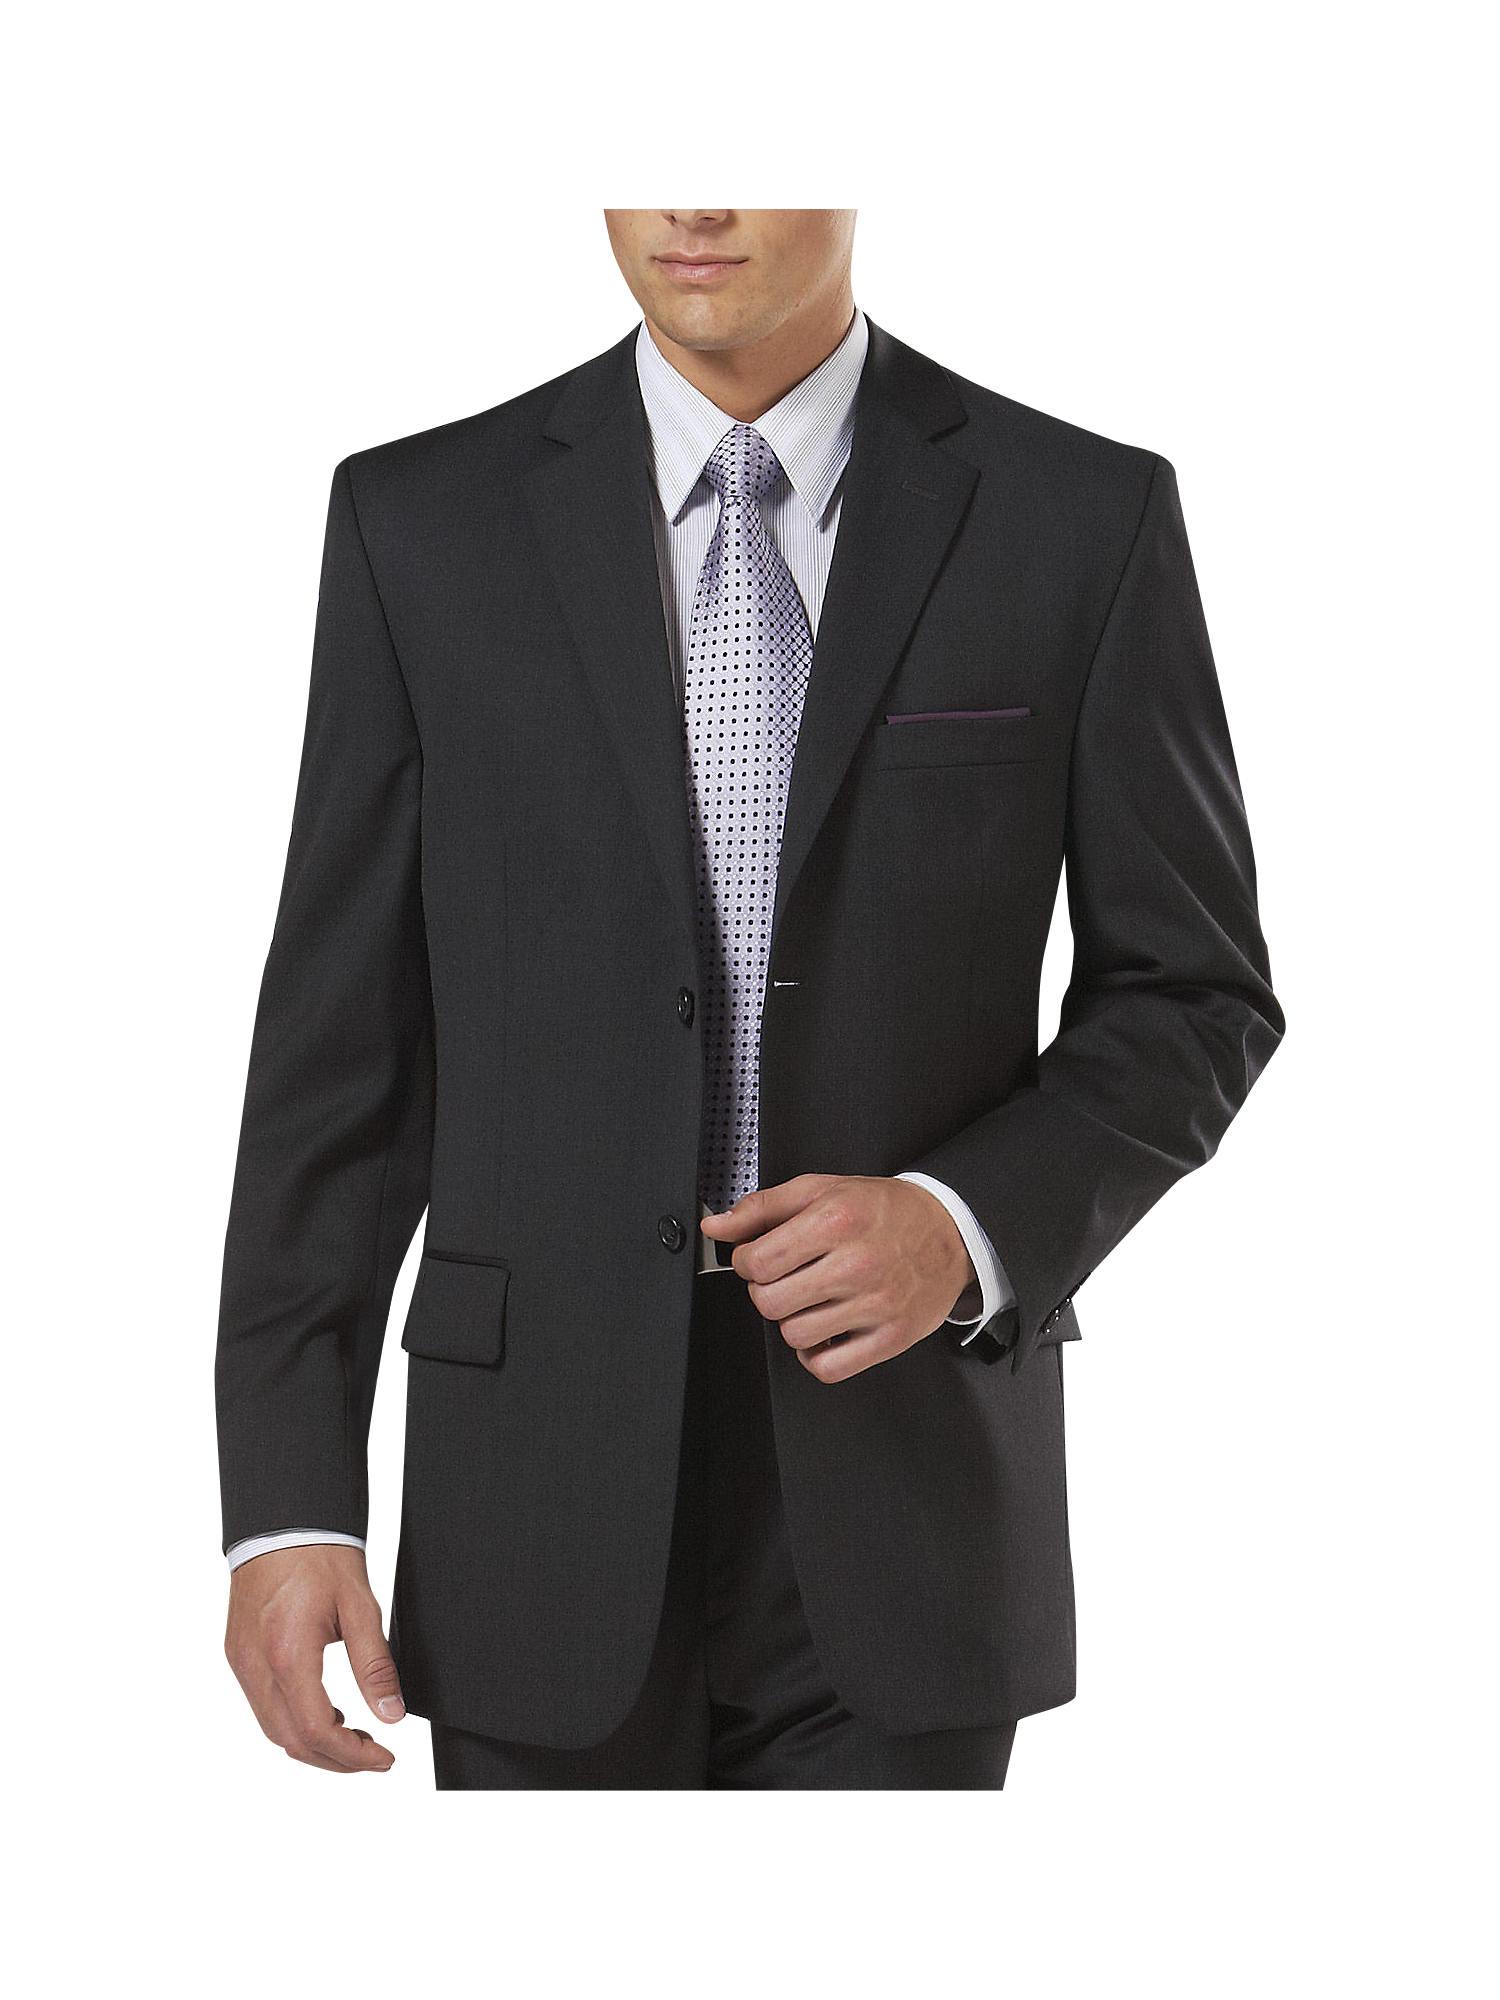 HQ Suit Wallpapers | File 197.86Kb